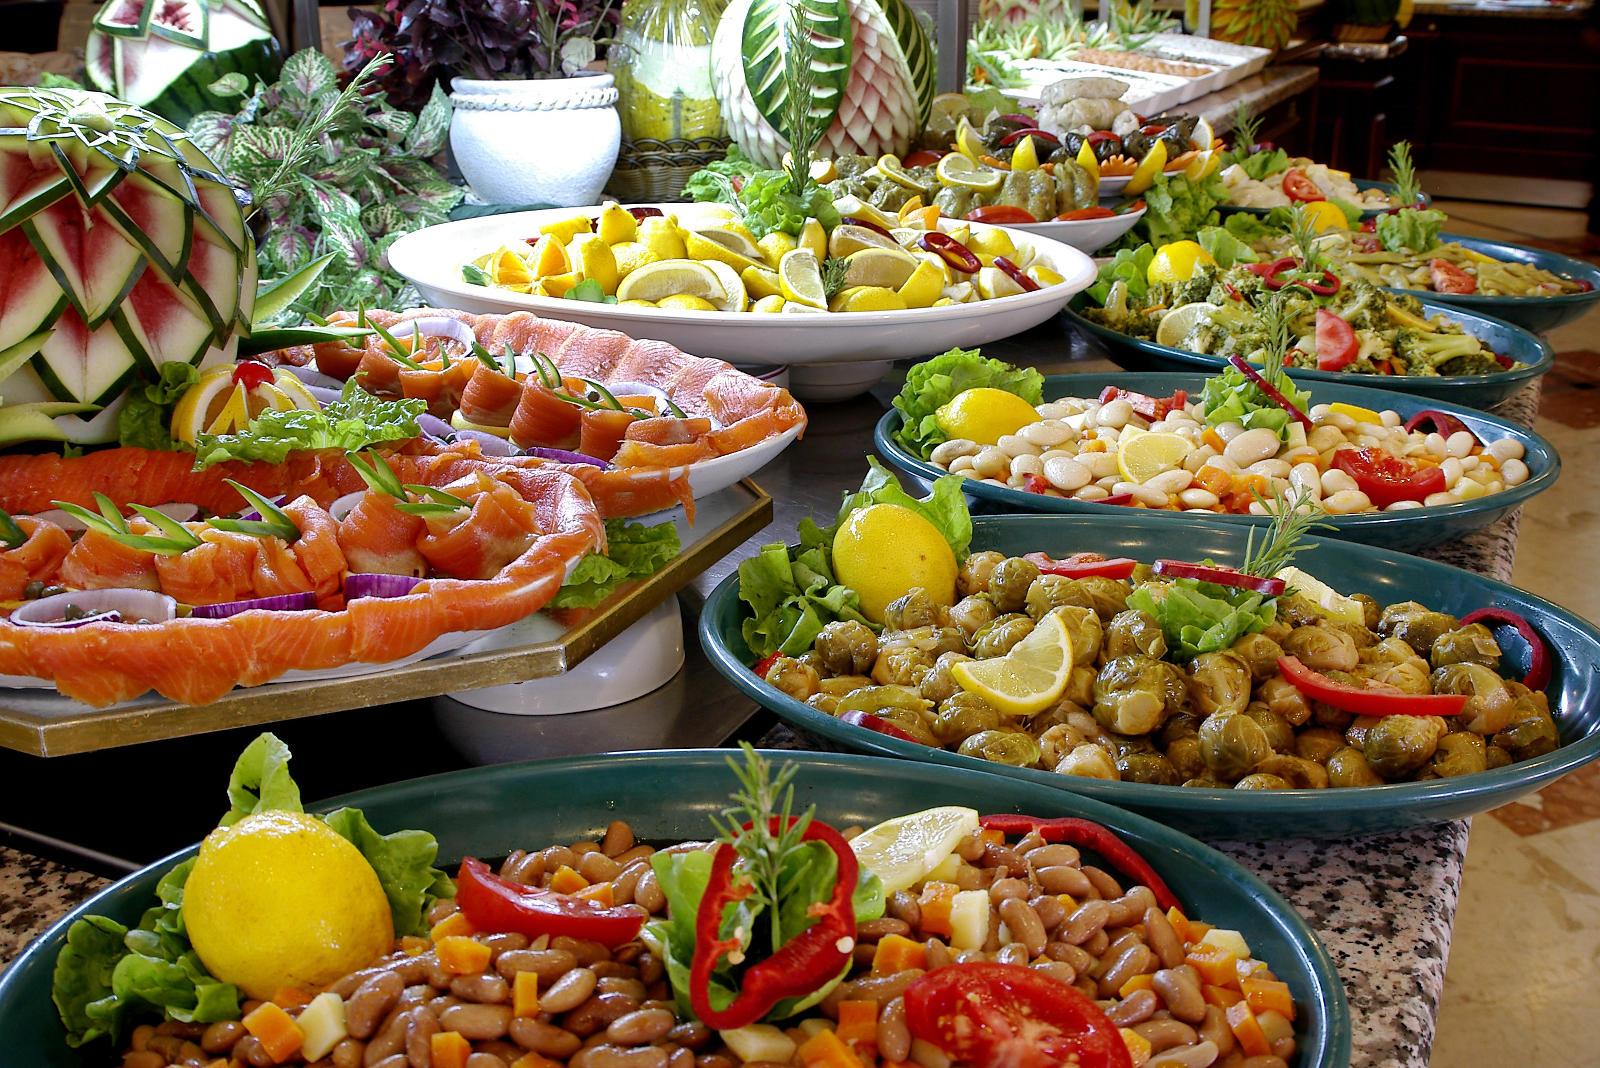 - Tavole apparecchiate per buffet ...